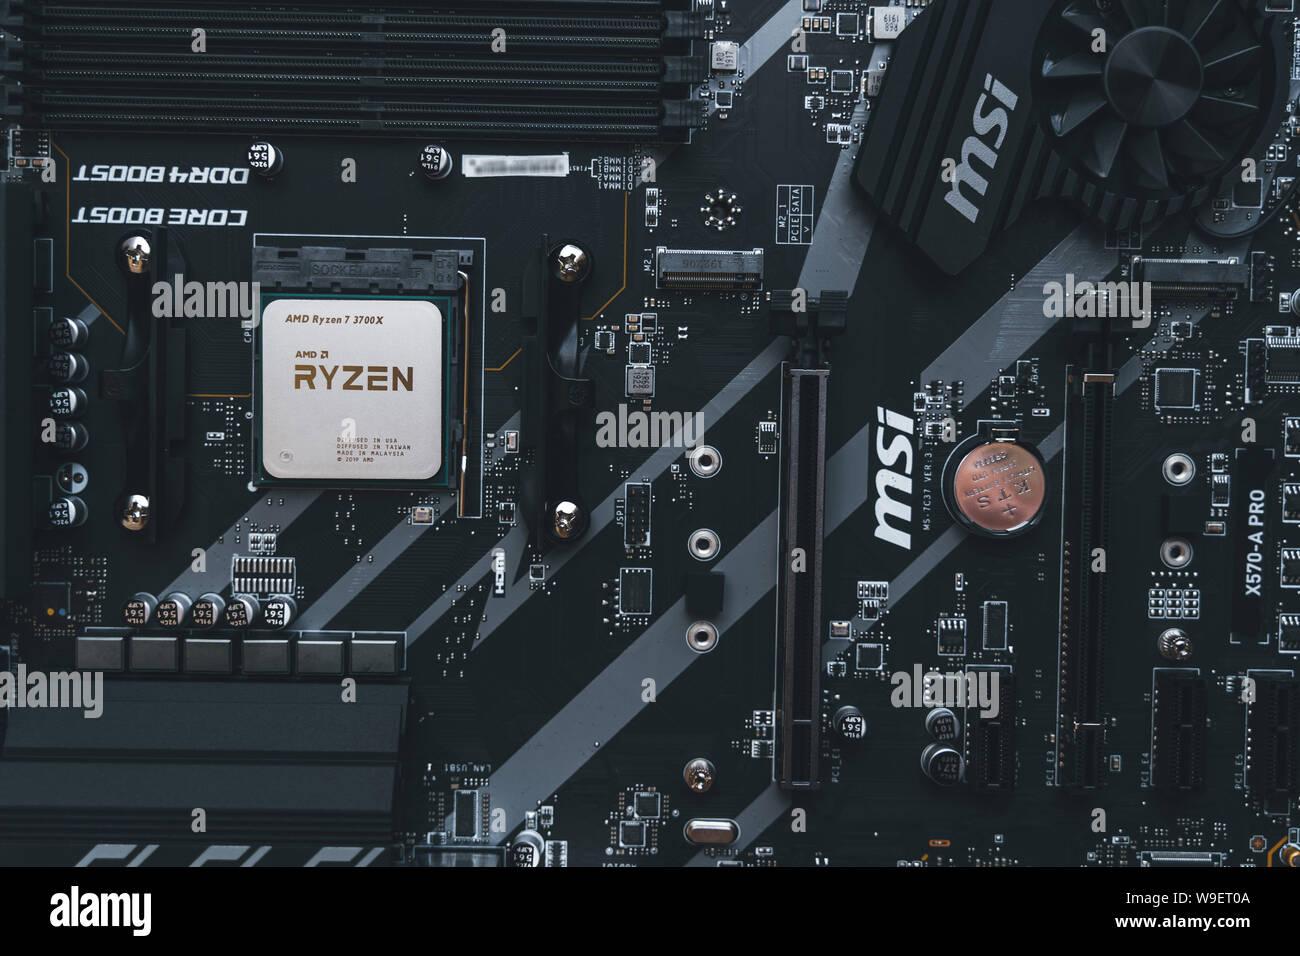 Amd Ryzen 3700x Processor In The X570 Motherboard Socket New Zen 2 7 Nanometer Desktop Cpu By Amd Very Popular 3rd Generation Ryzen 3000 Processor Stock Photo Alamy